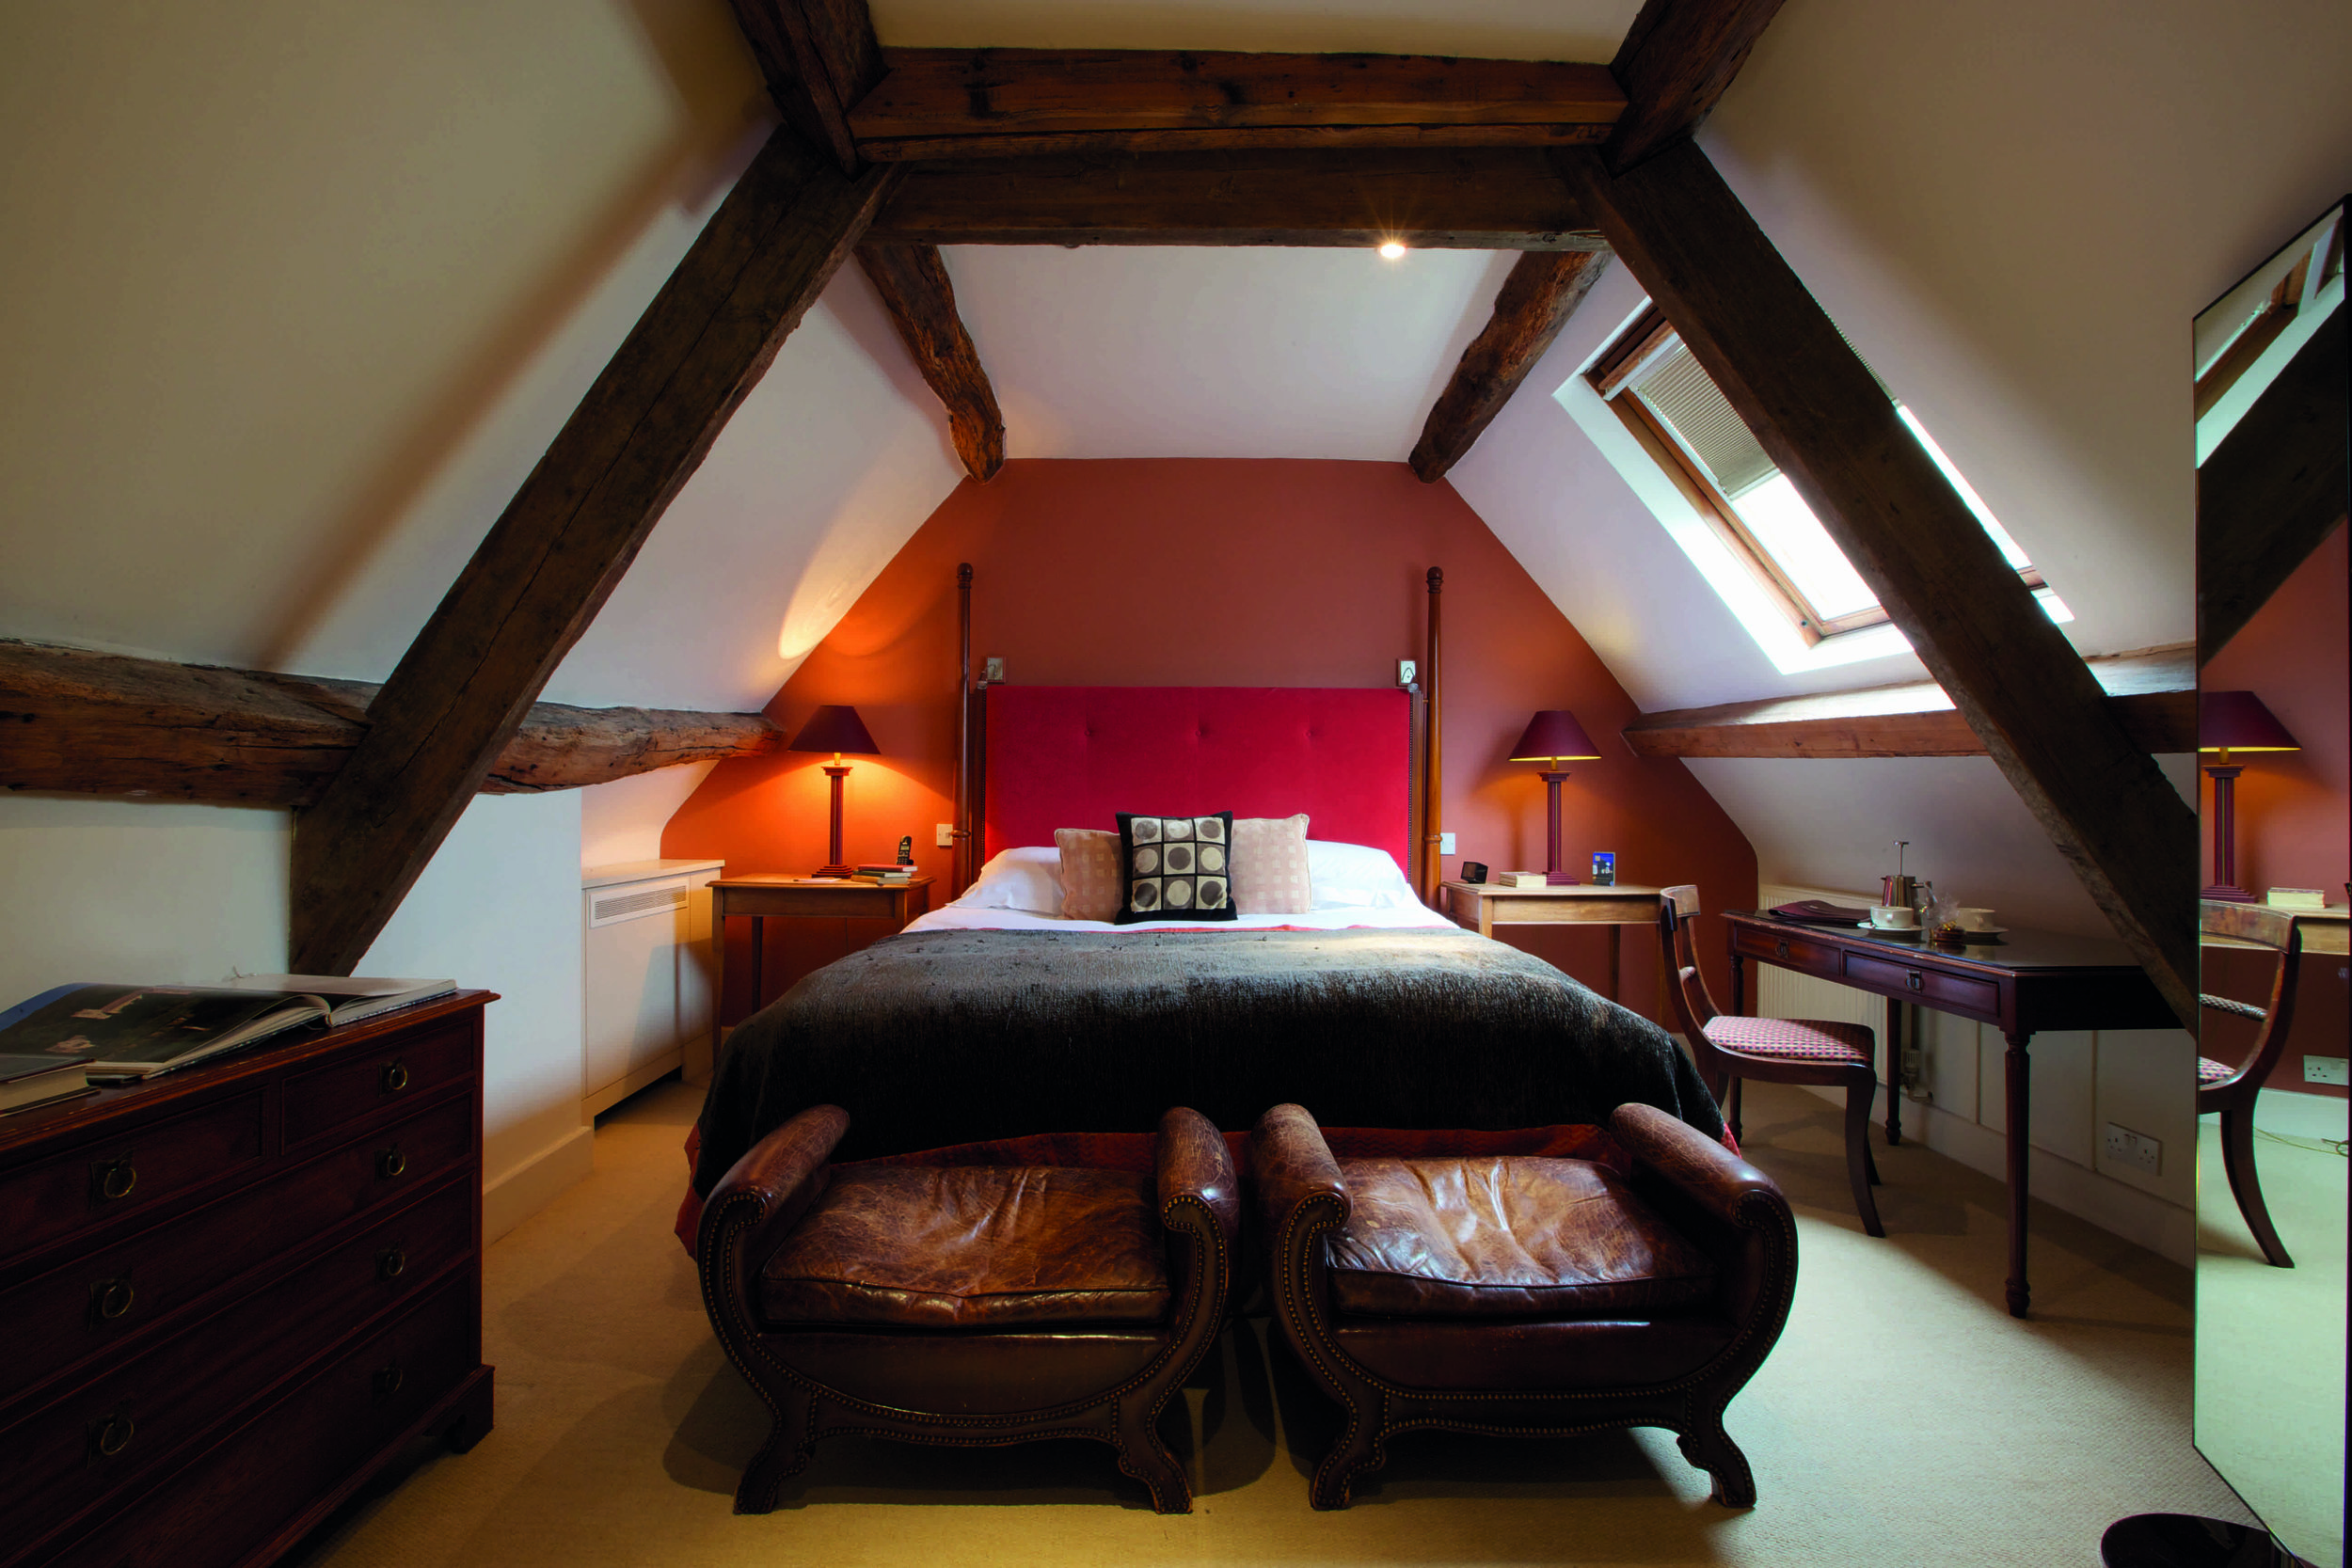 Hot Tub Suite, Cotswold House Hotel, C Campden copy.jpg